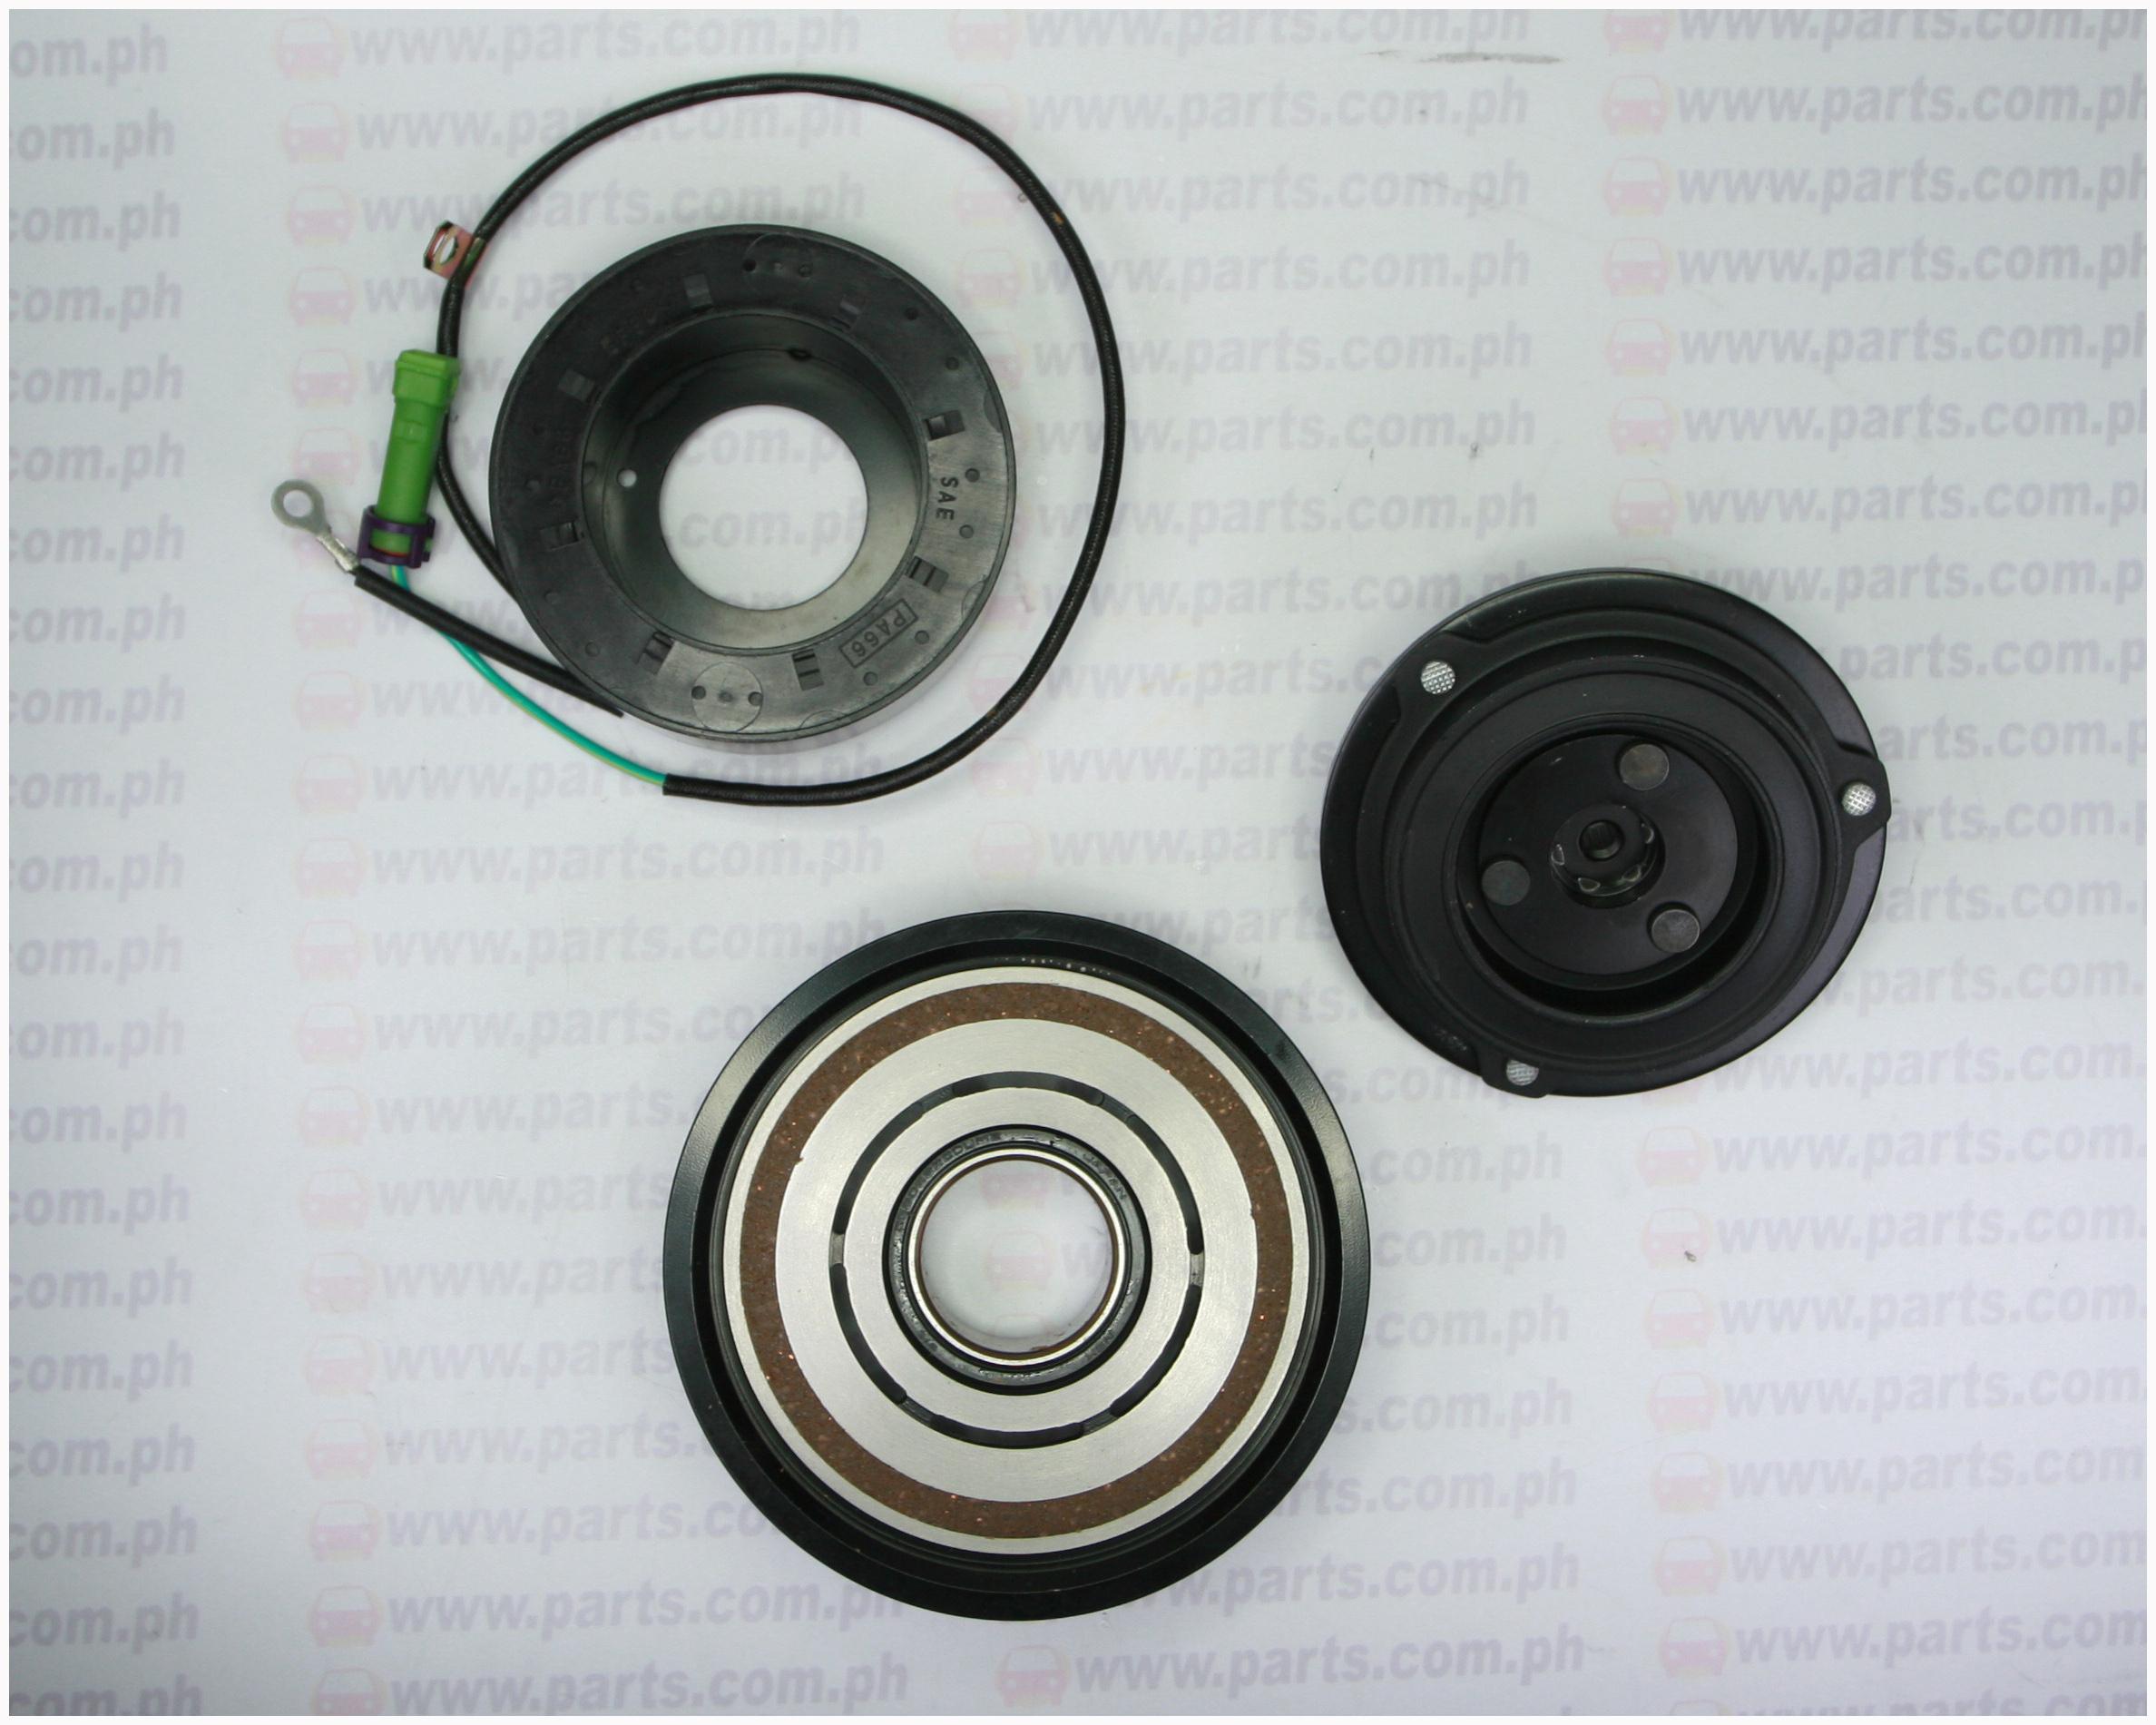 AC Compressor Clutch - A4,A6,A8,RS4,RS6,passat - TwinCell